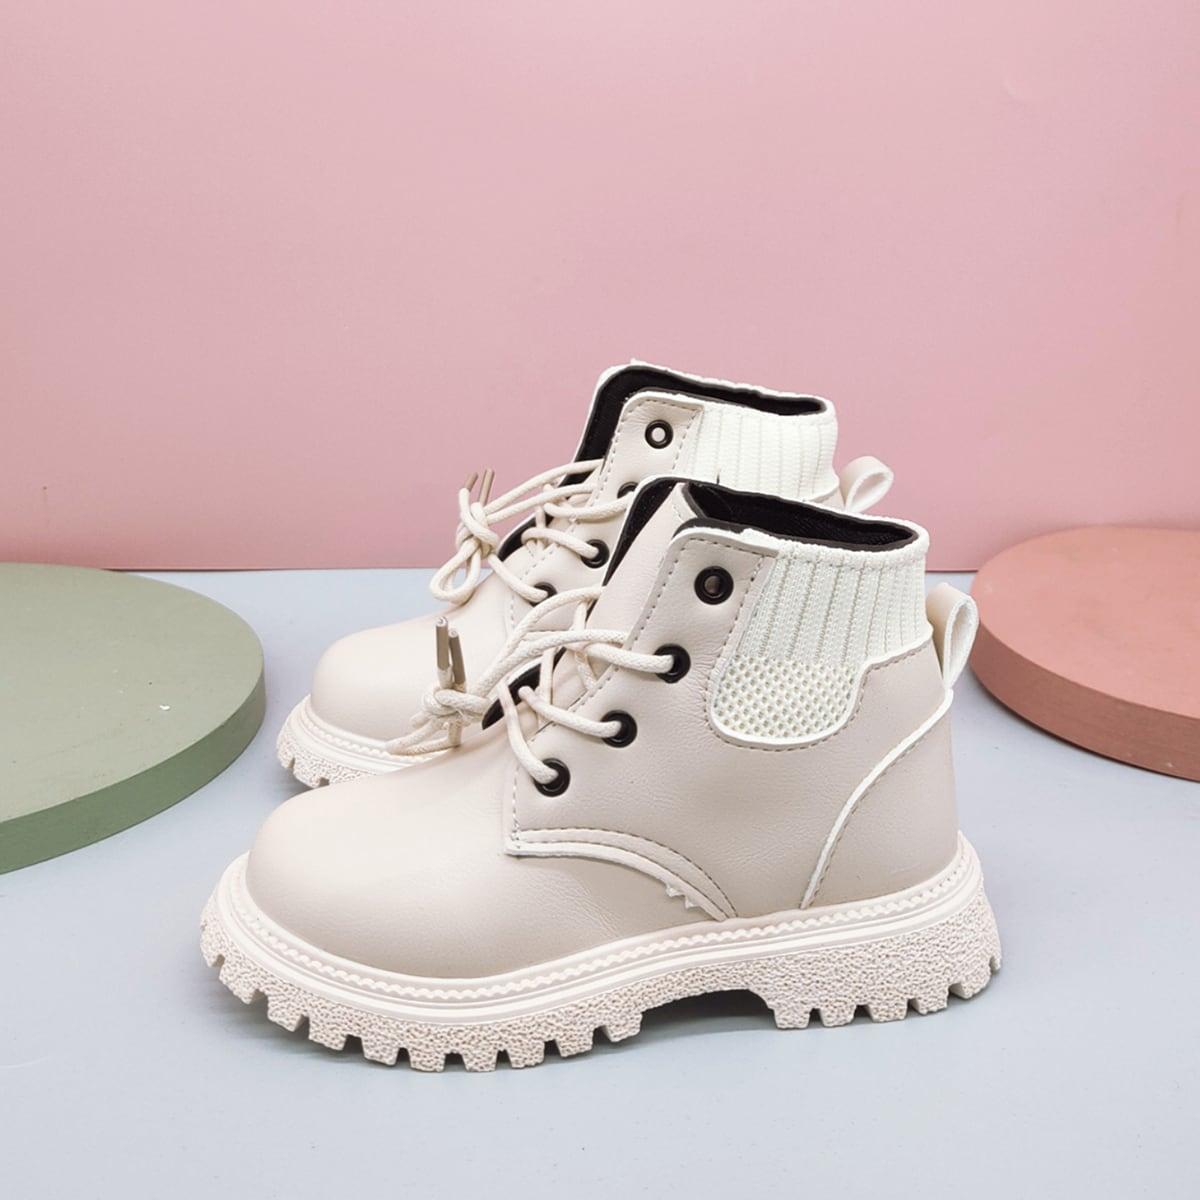 Ботинки на шнурках для мальчиков SheIn sk2108081712493457